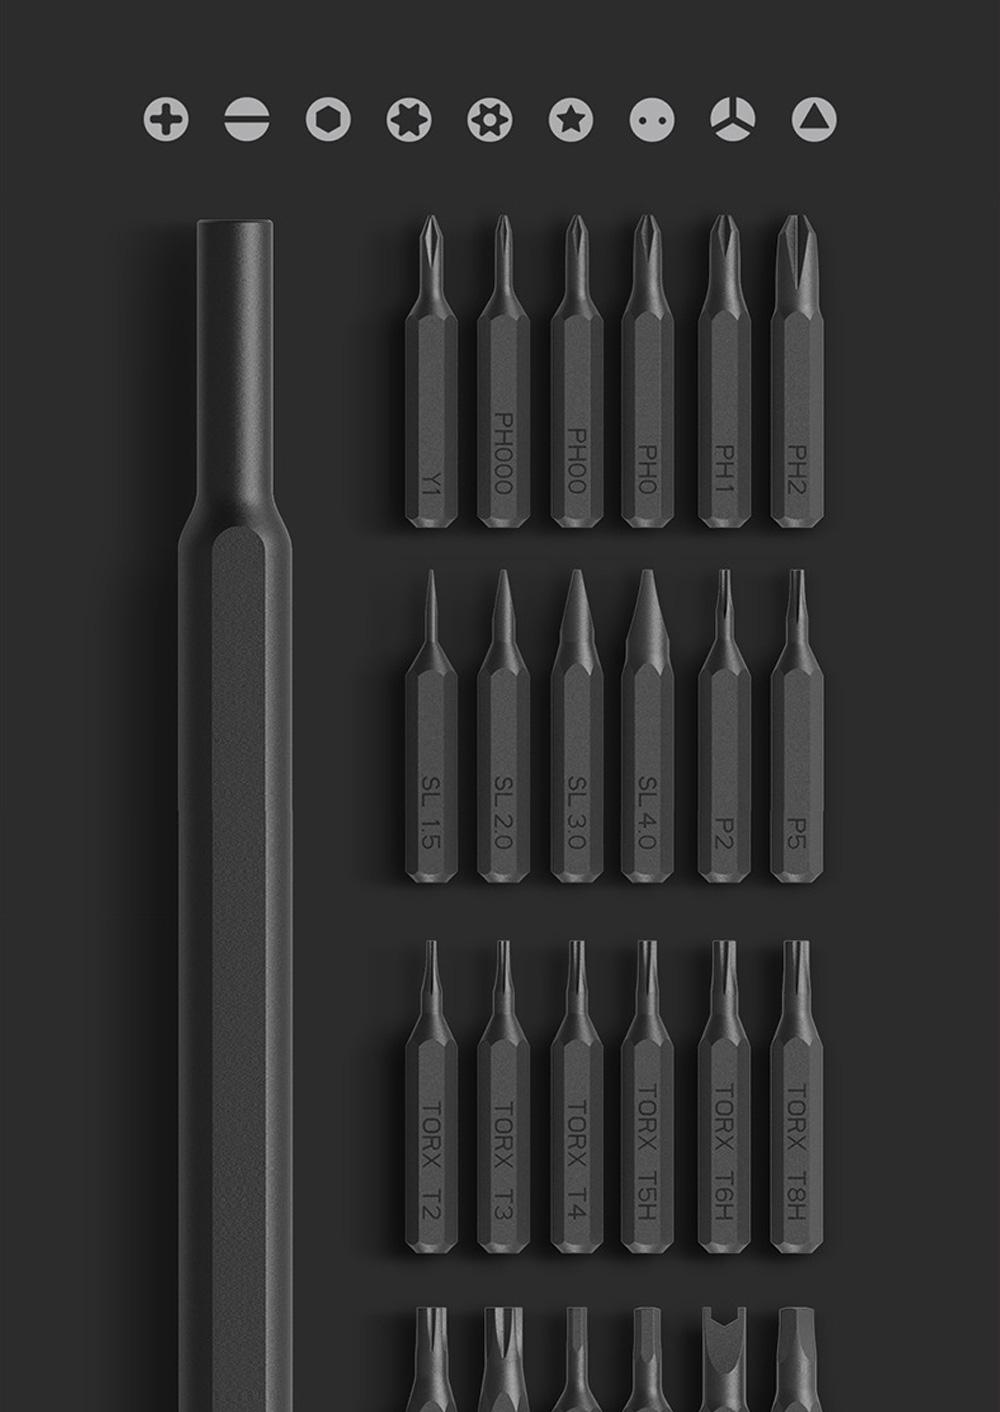 MI Wiha Precision Screwdrivers Set 25 in 1 Household Repair Tool Kits with Aluminum Storage Box for Appliance Repair 1